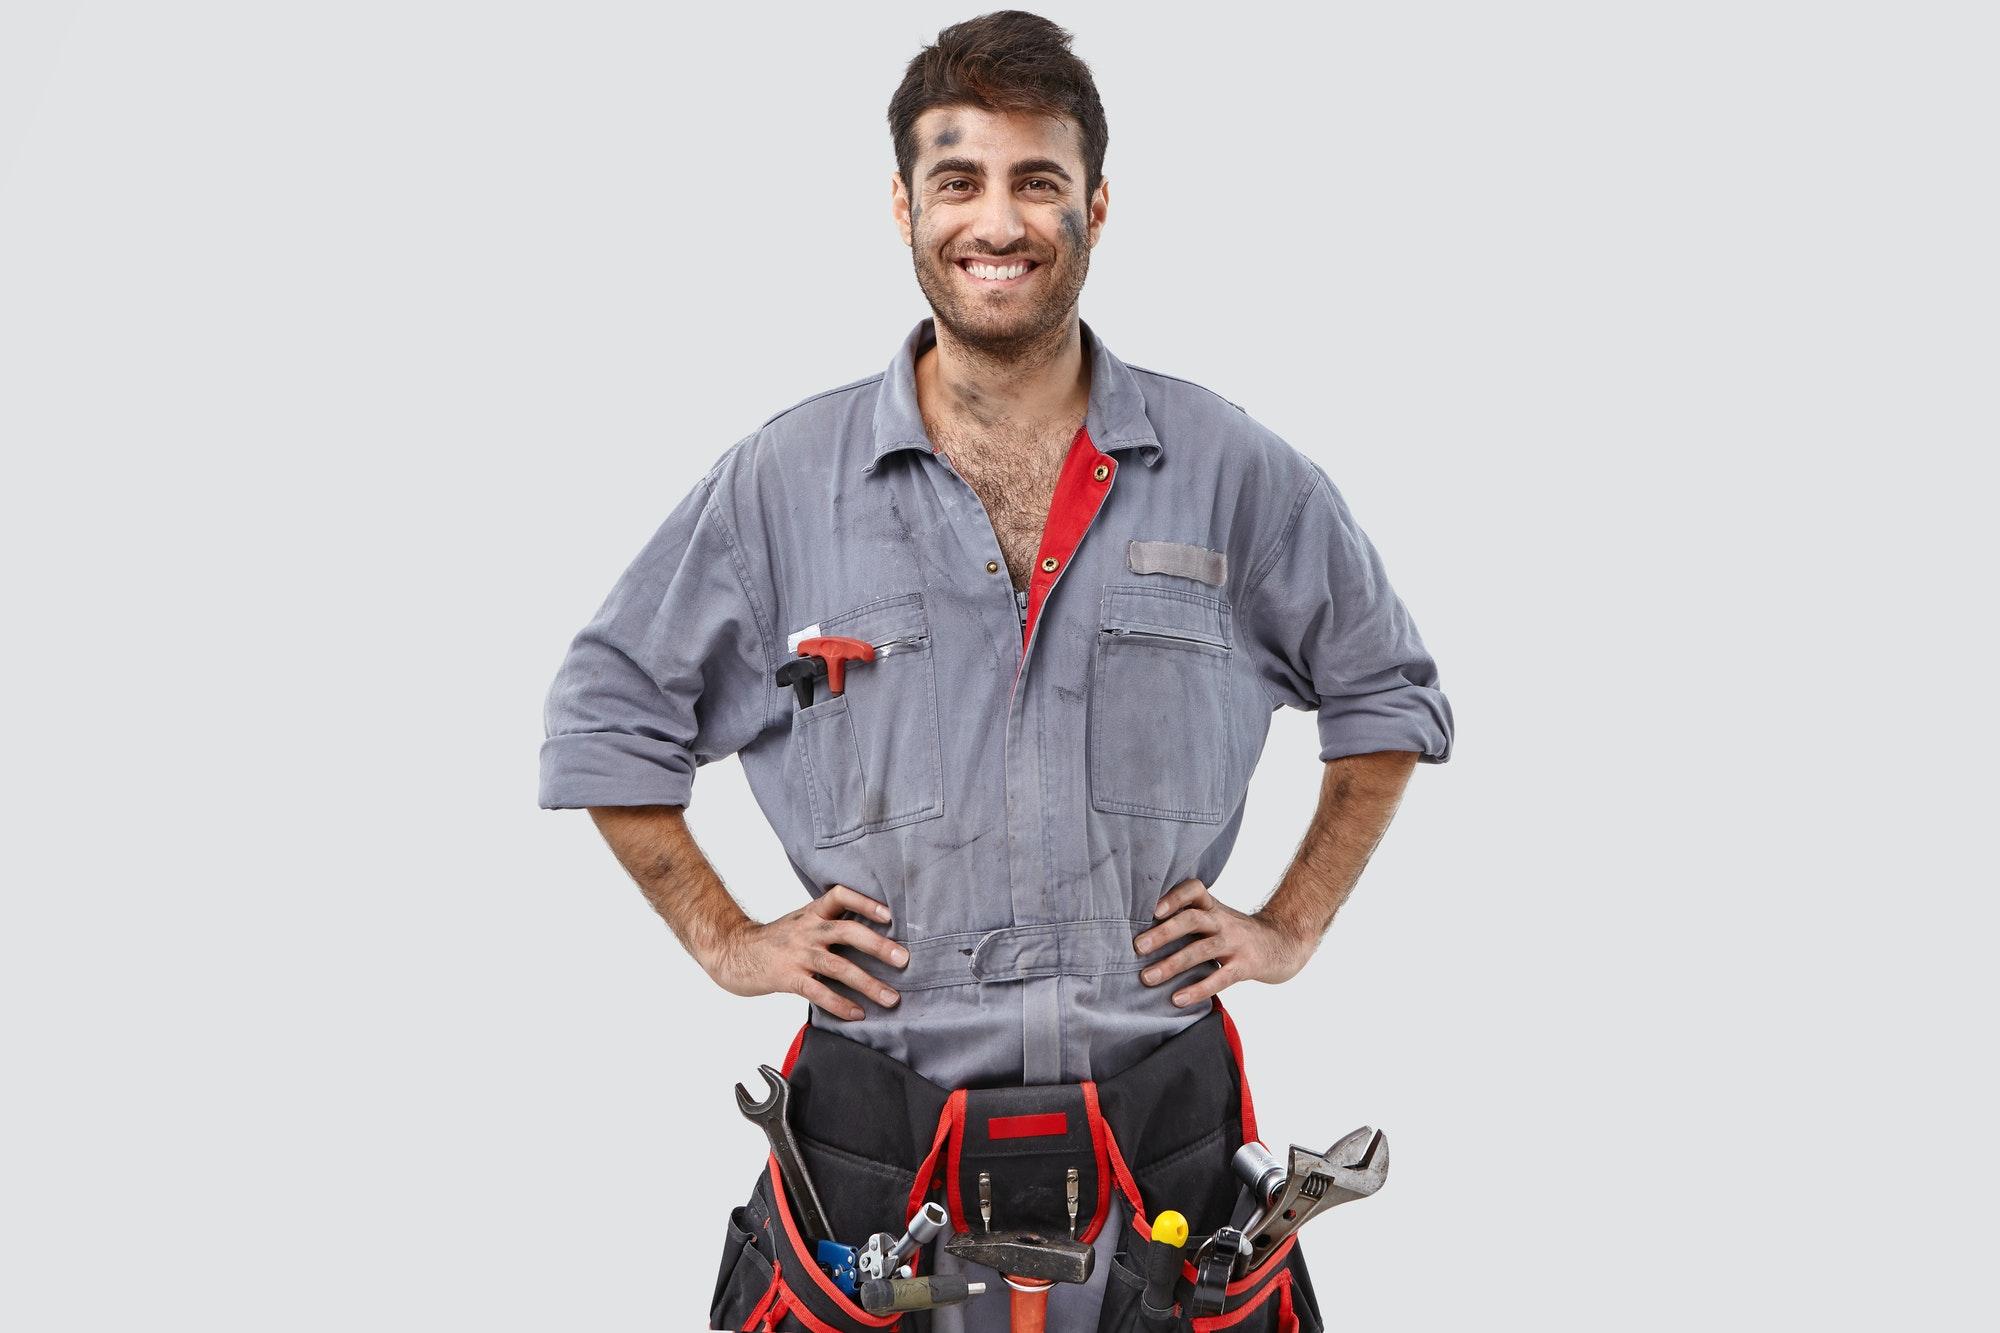 Handyman dc